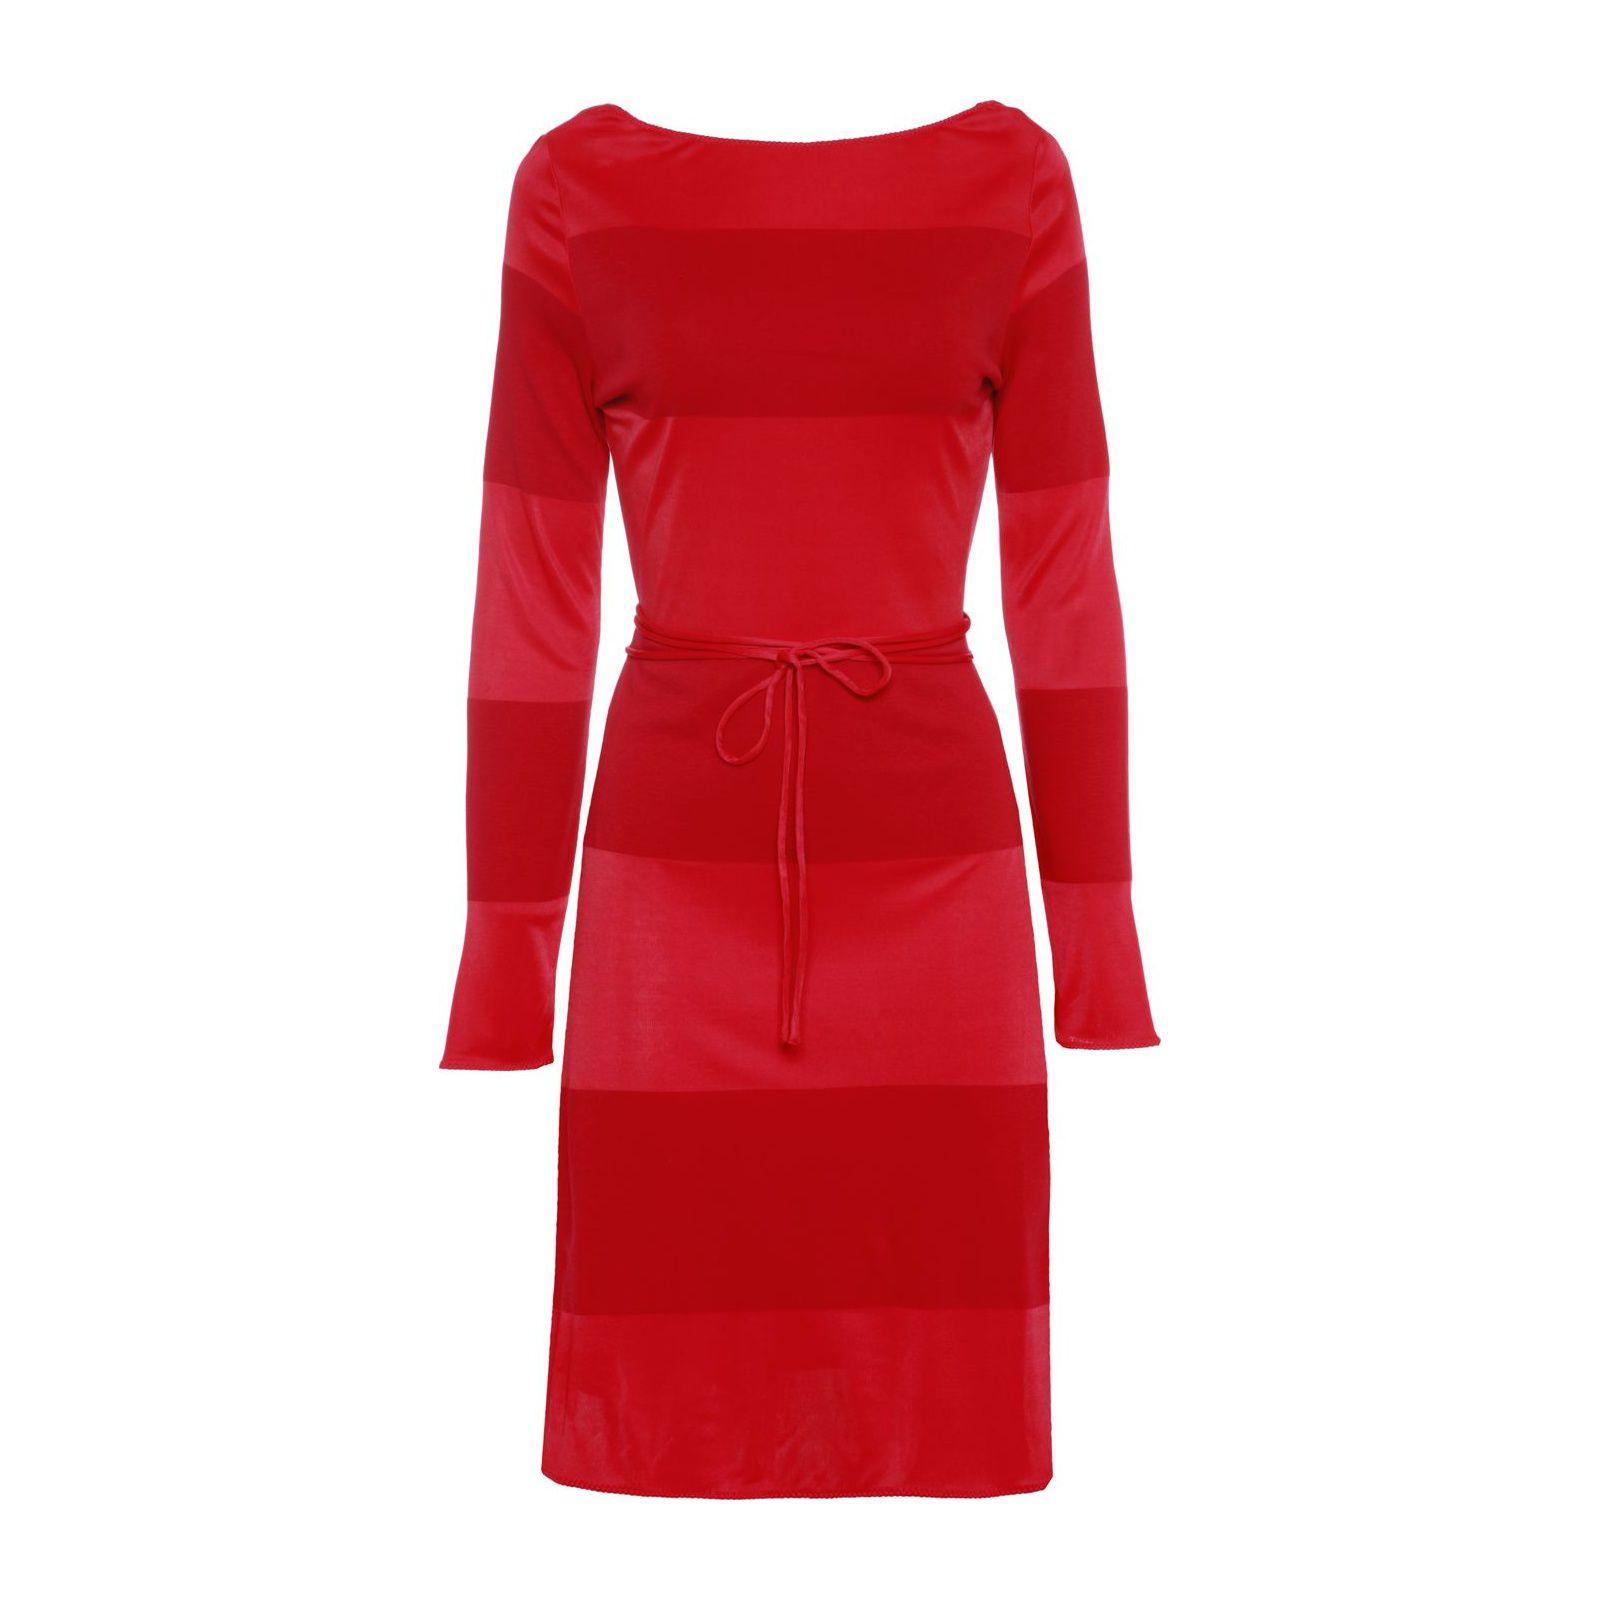 Vestido Stripes Gigi Hadid - Vermelho